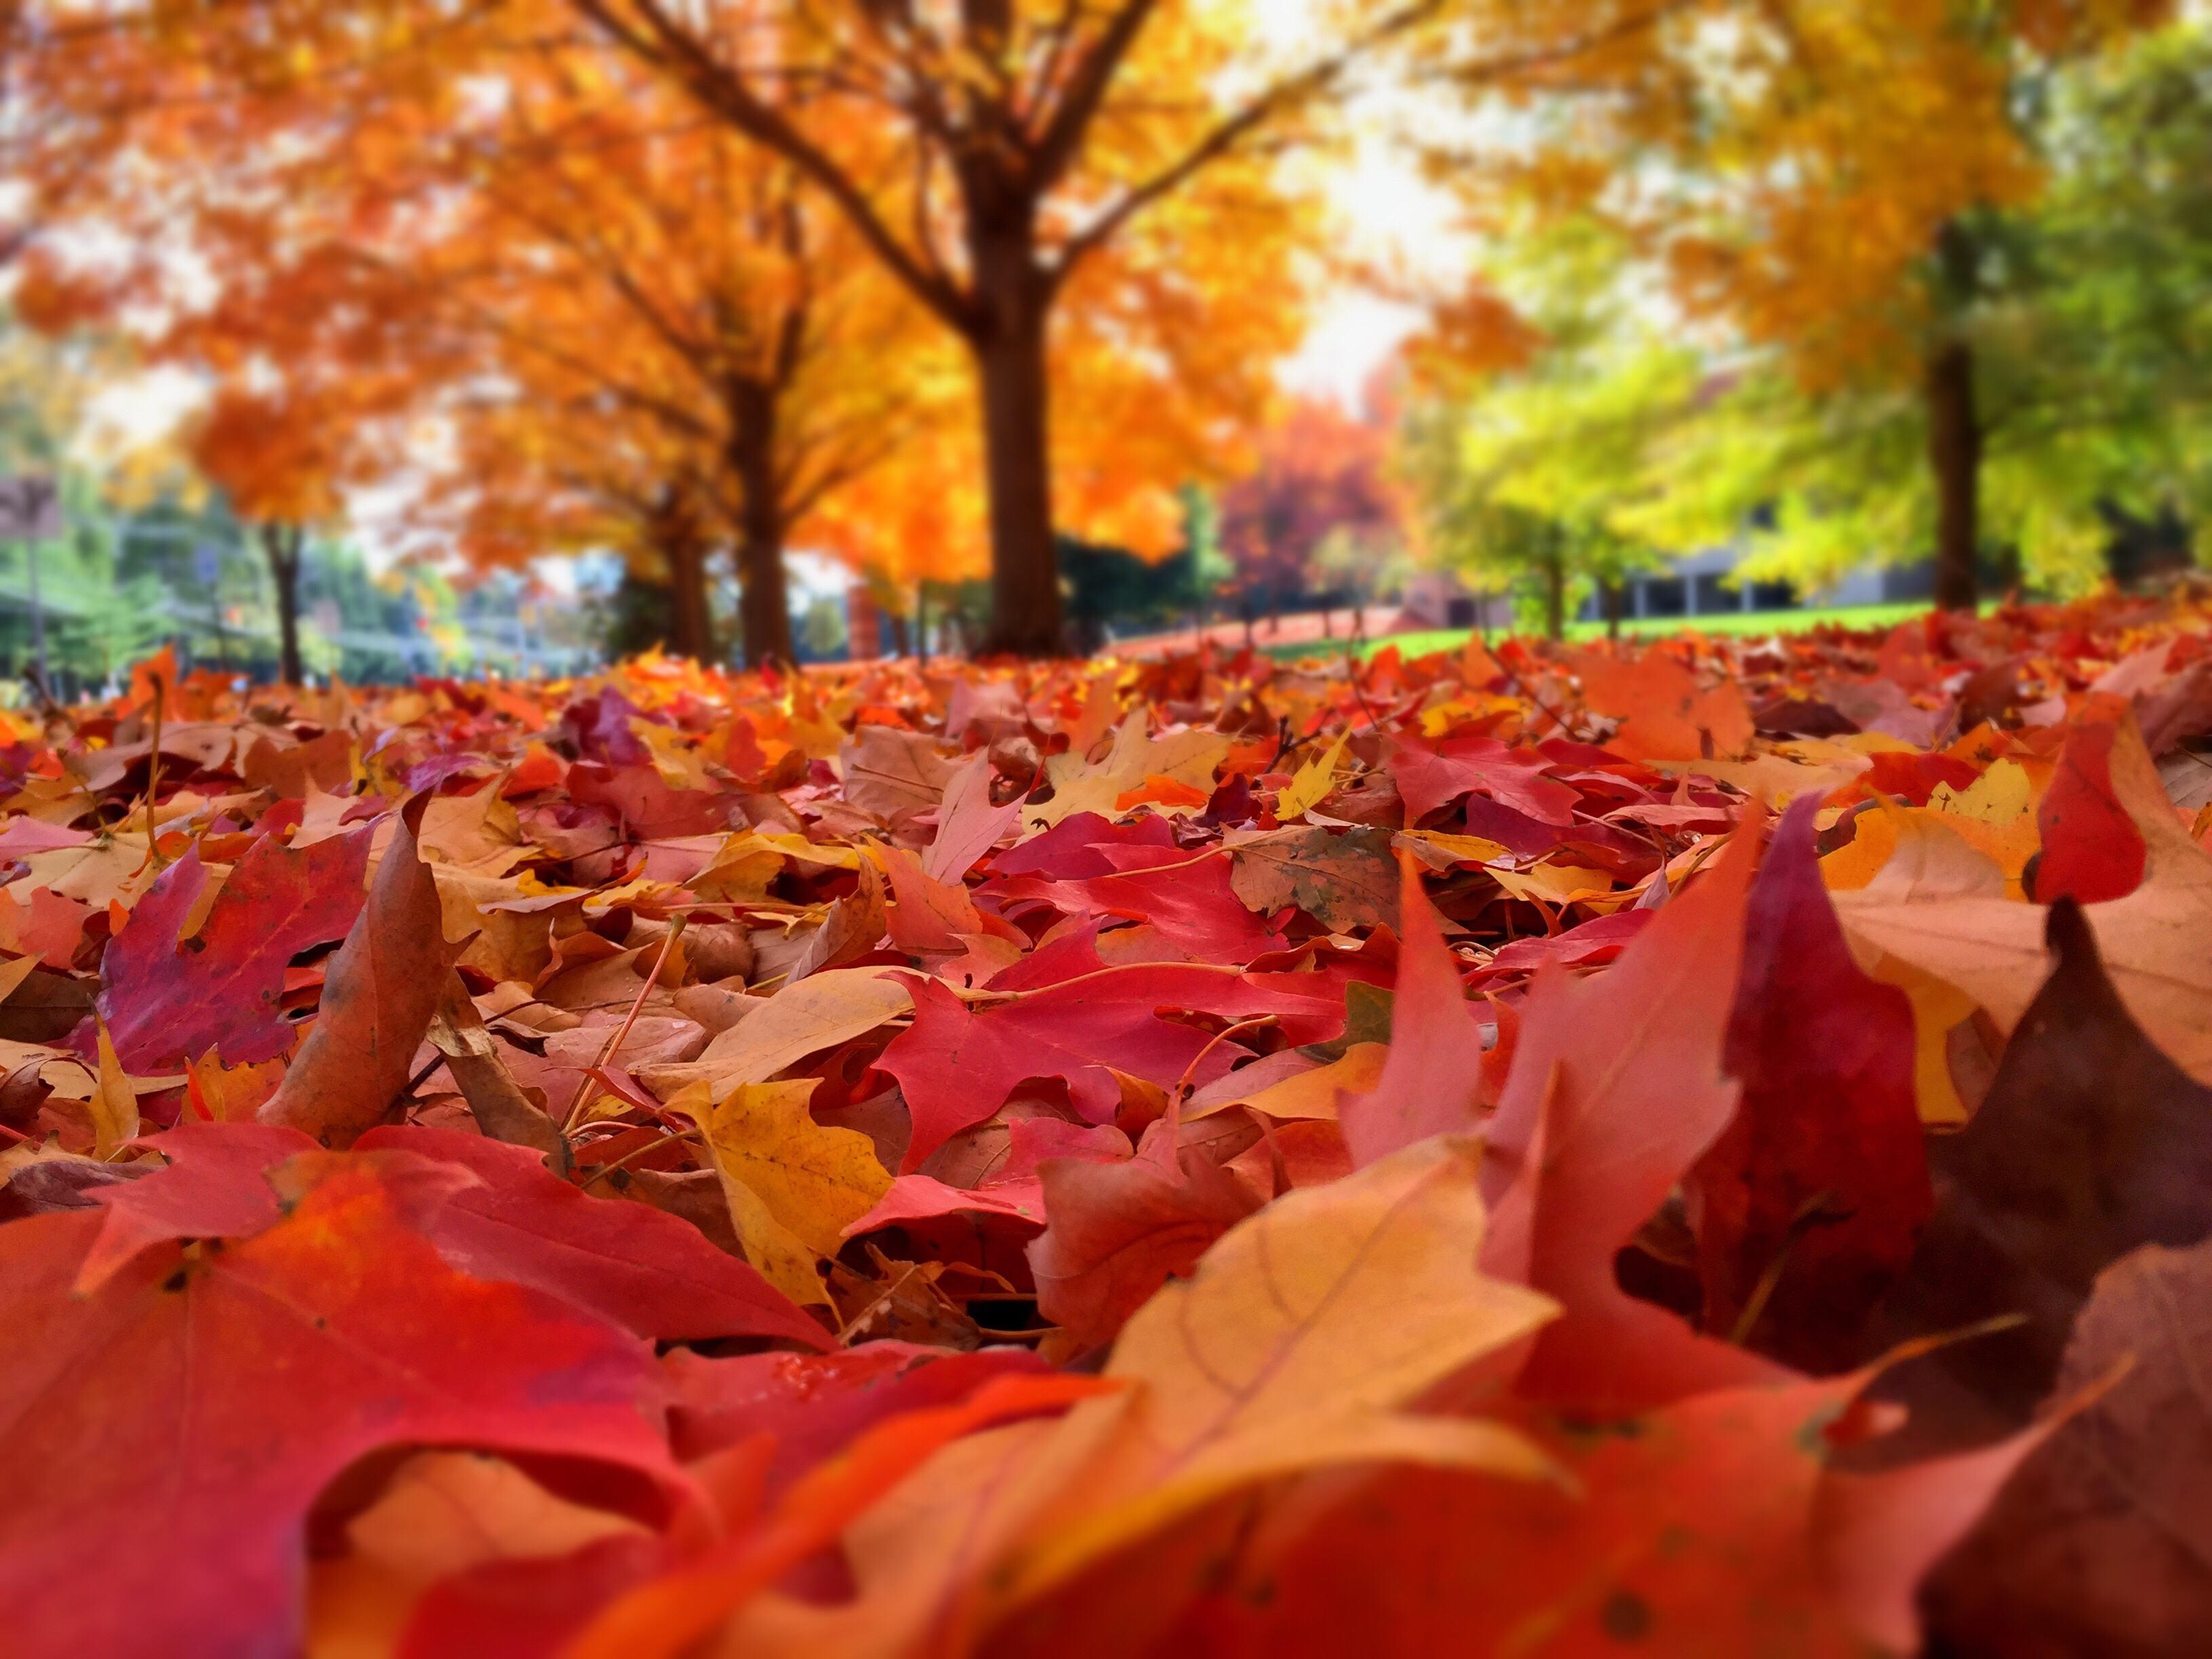 Fall In The Smokies Wallpaper Buckhorn Inn Bed And Breakfast In Gatlinburg Tennessee In